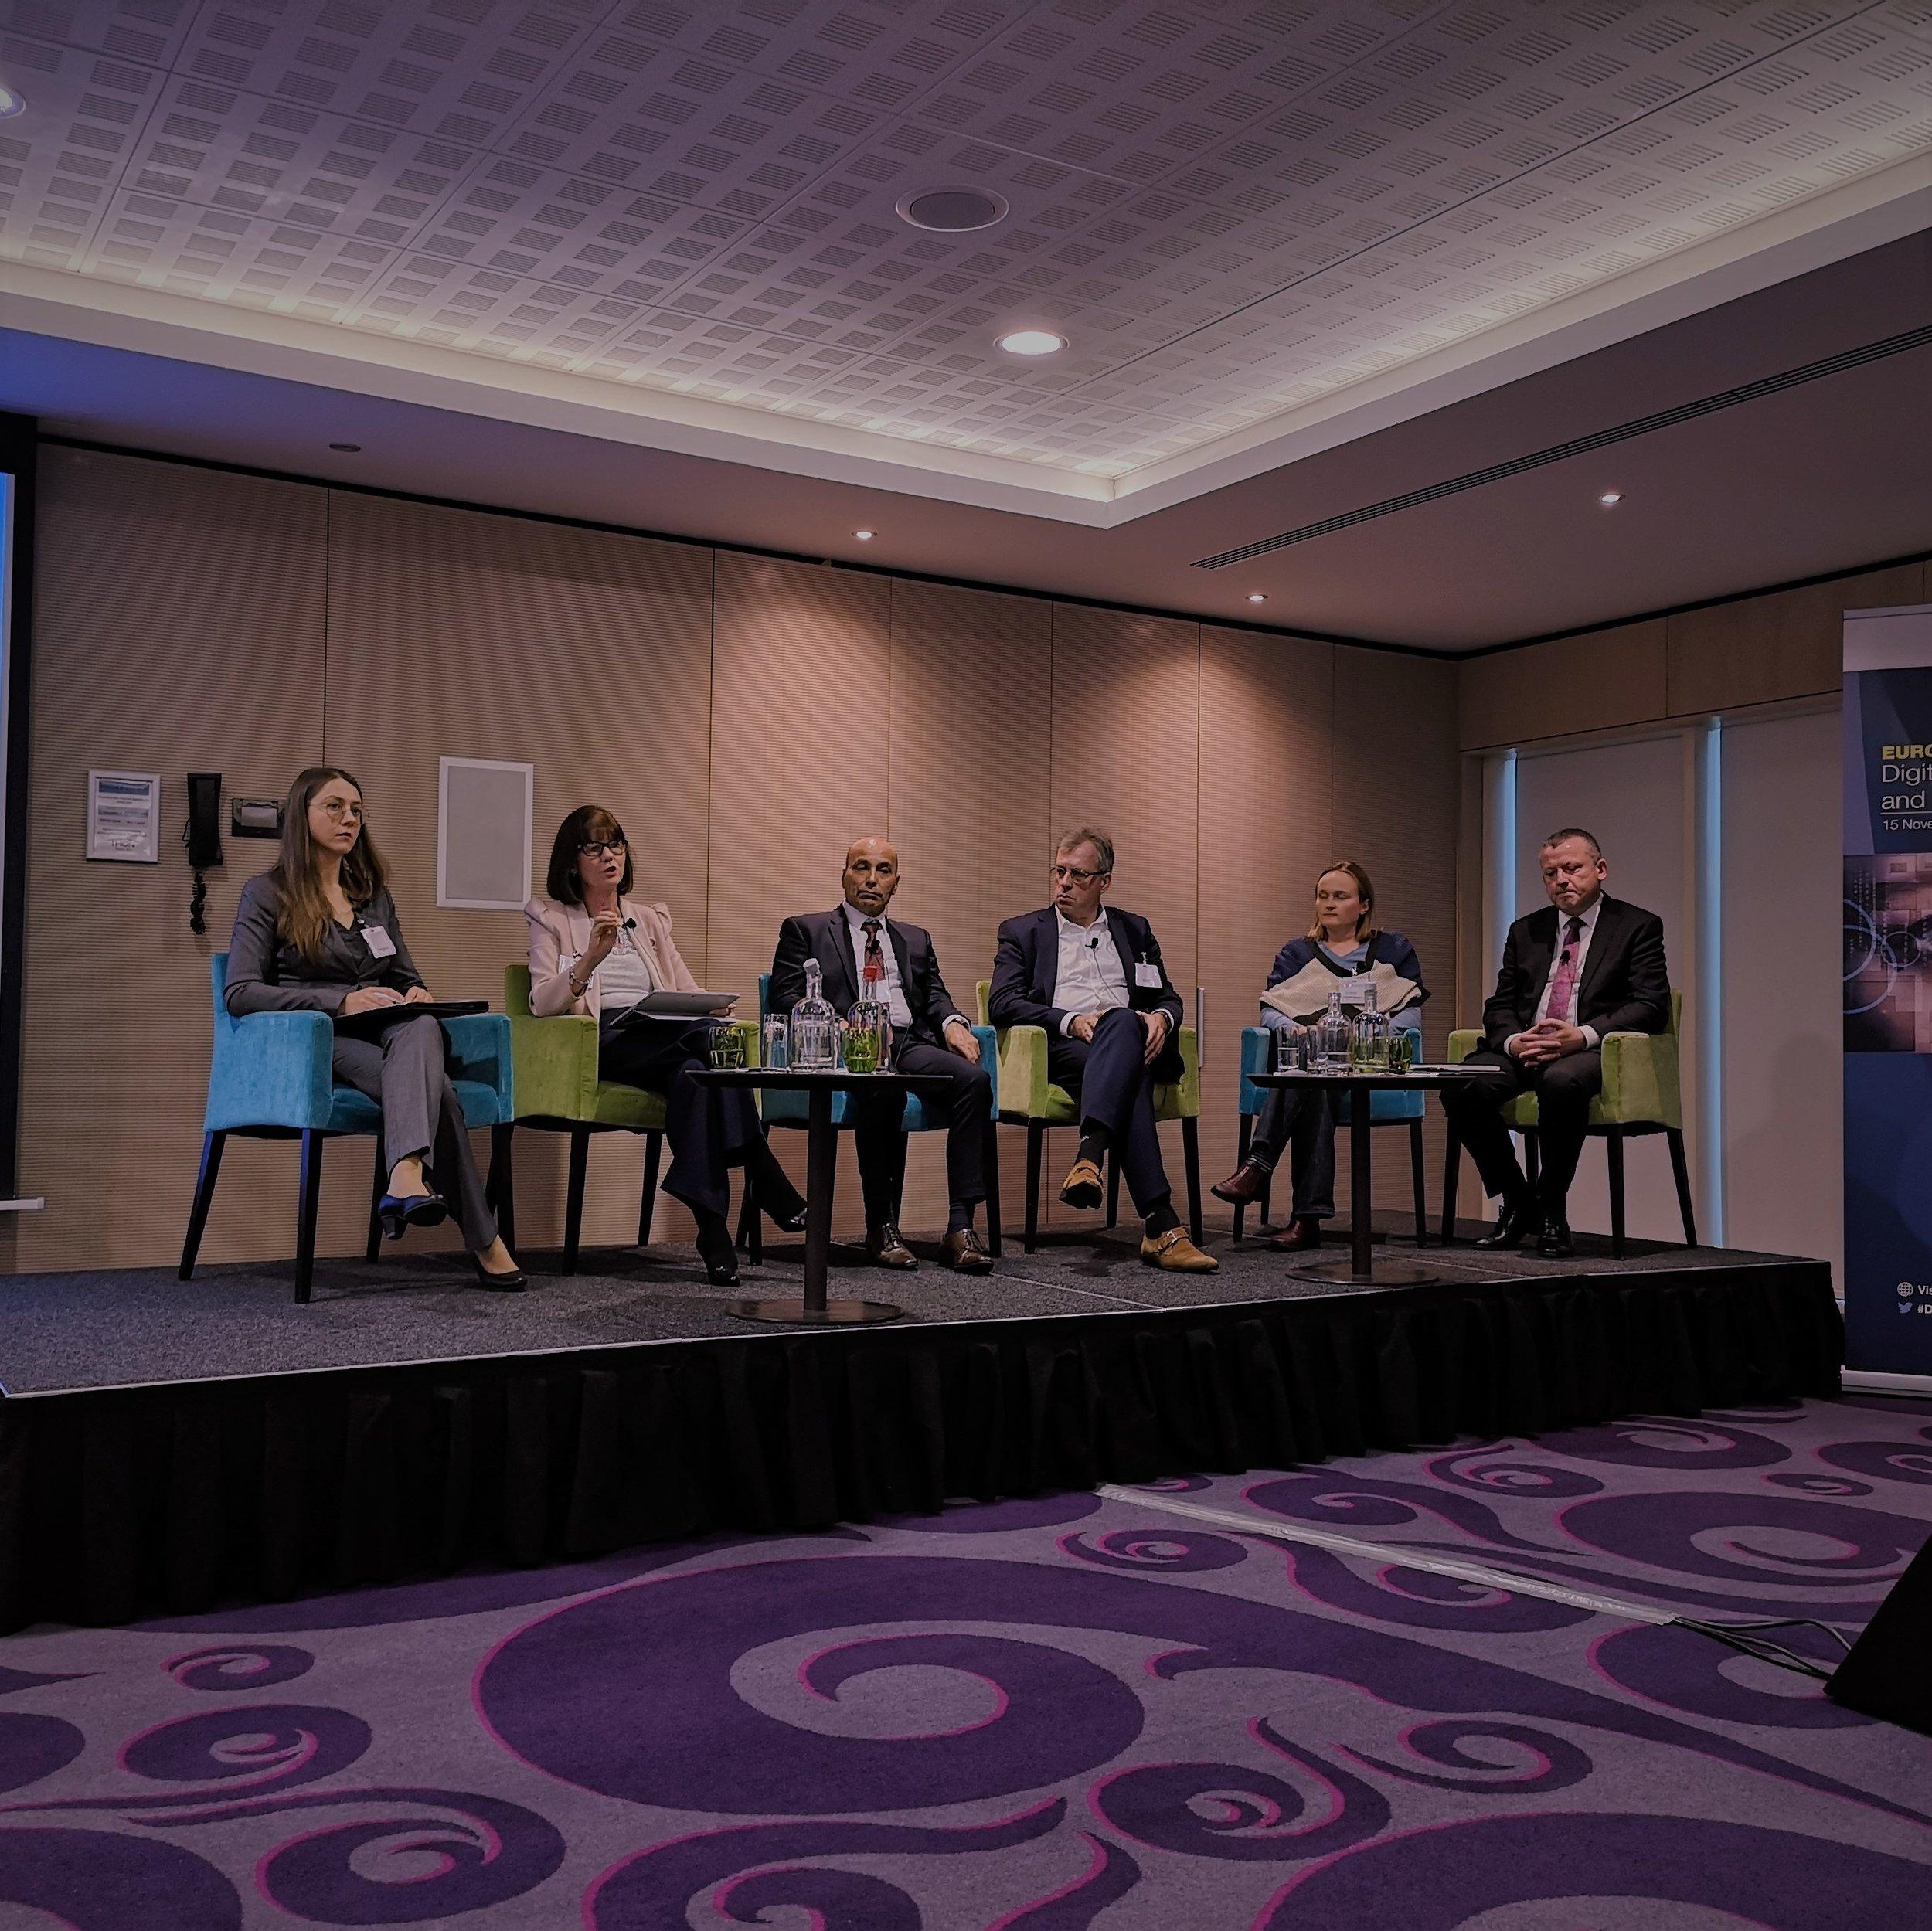 Final panel featuring (from left) Austeja Trinkunaite (CEPIS), Mary Cleary (ICS), Carmel Cachia (e-Skills Malta Foundation), Floor Scheffer (Tata Steel), Anna Stepanoff (Wild Code School) & Damien O'Sullivan (ECDL Foundation).